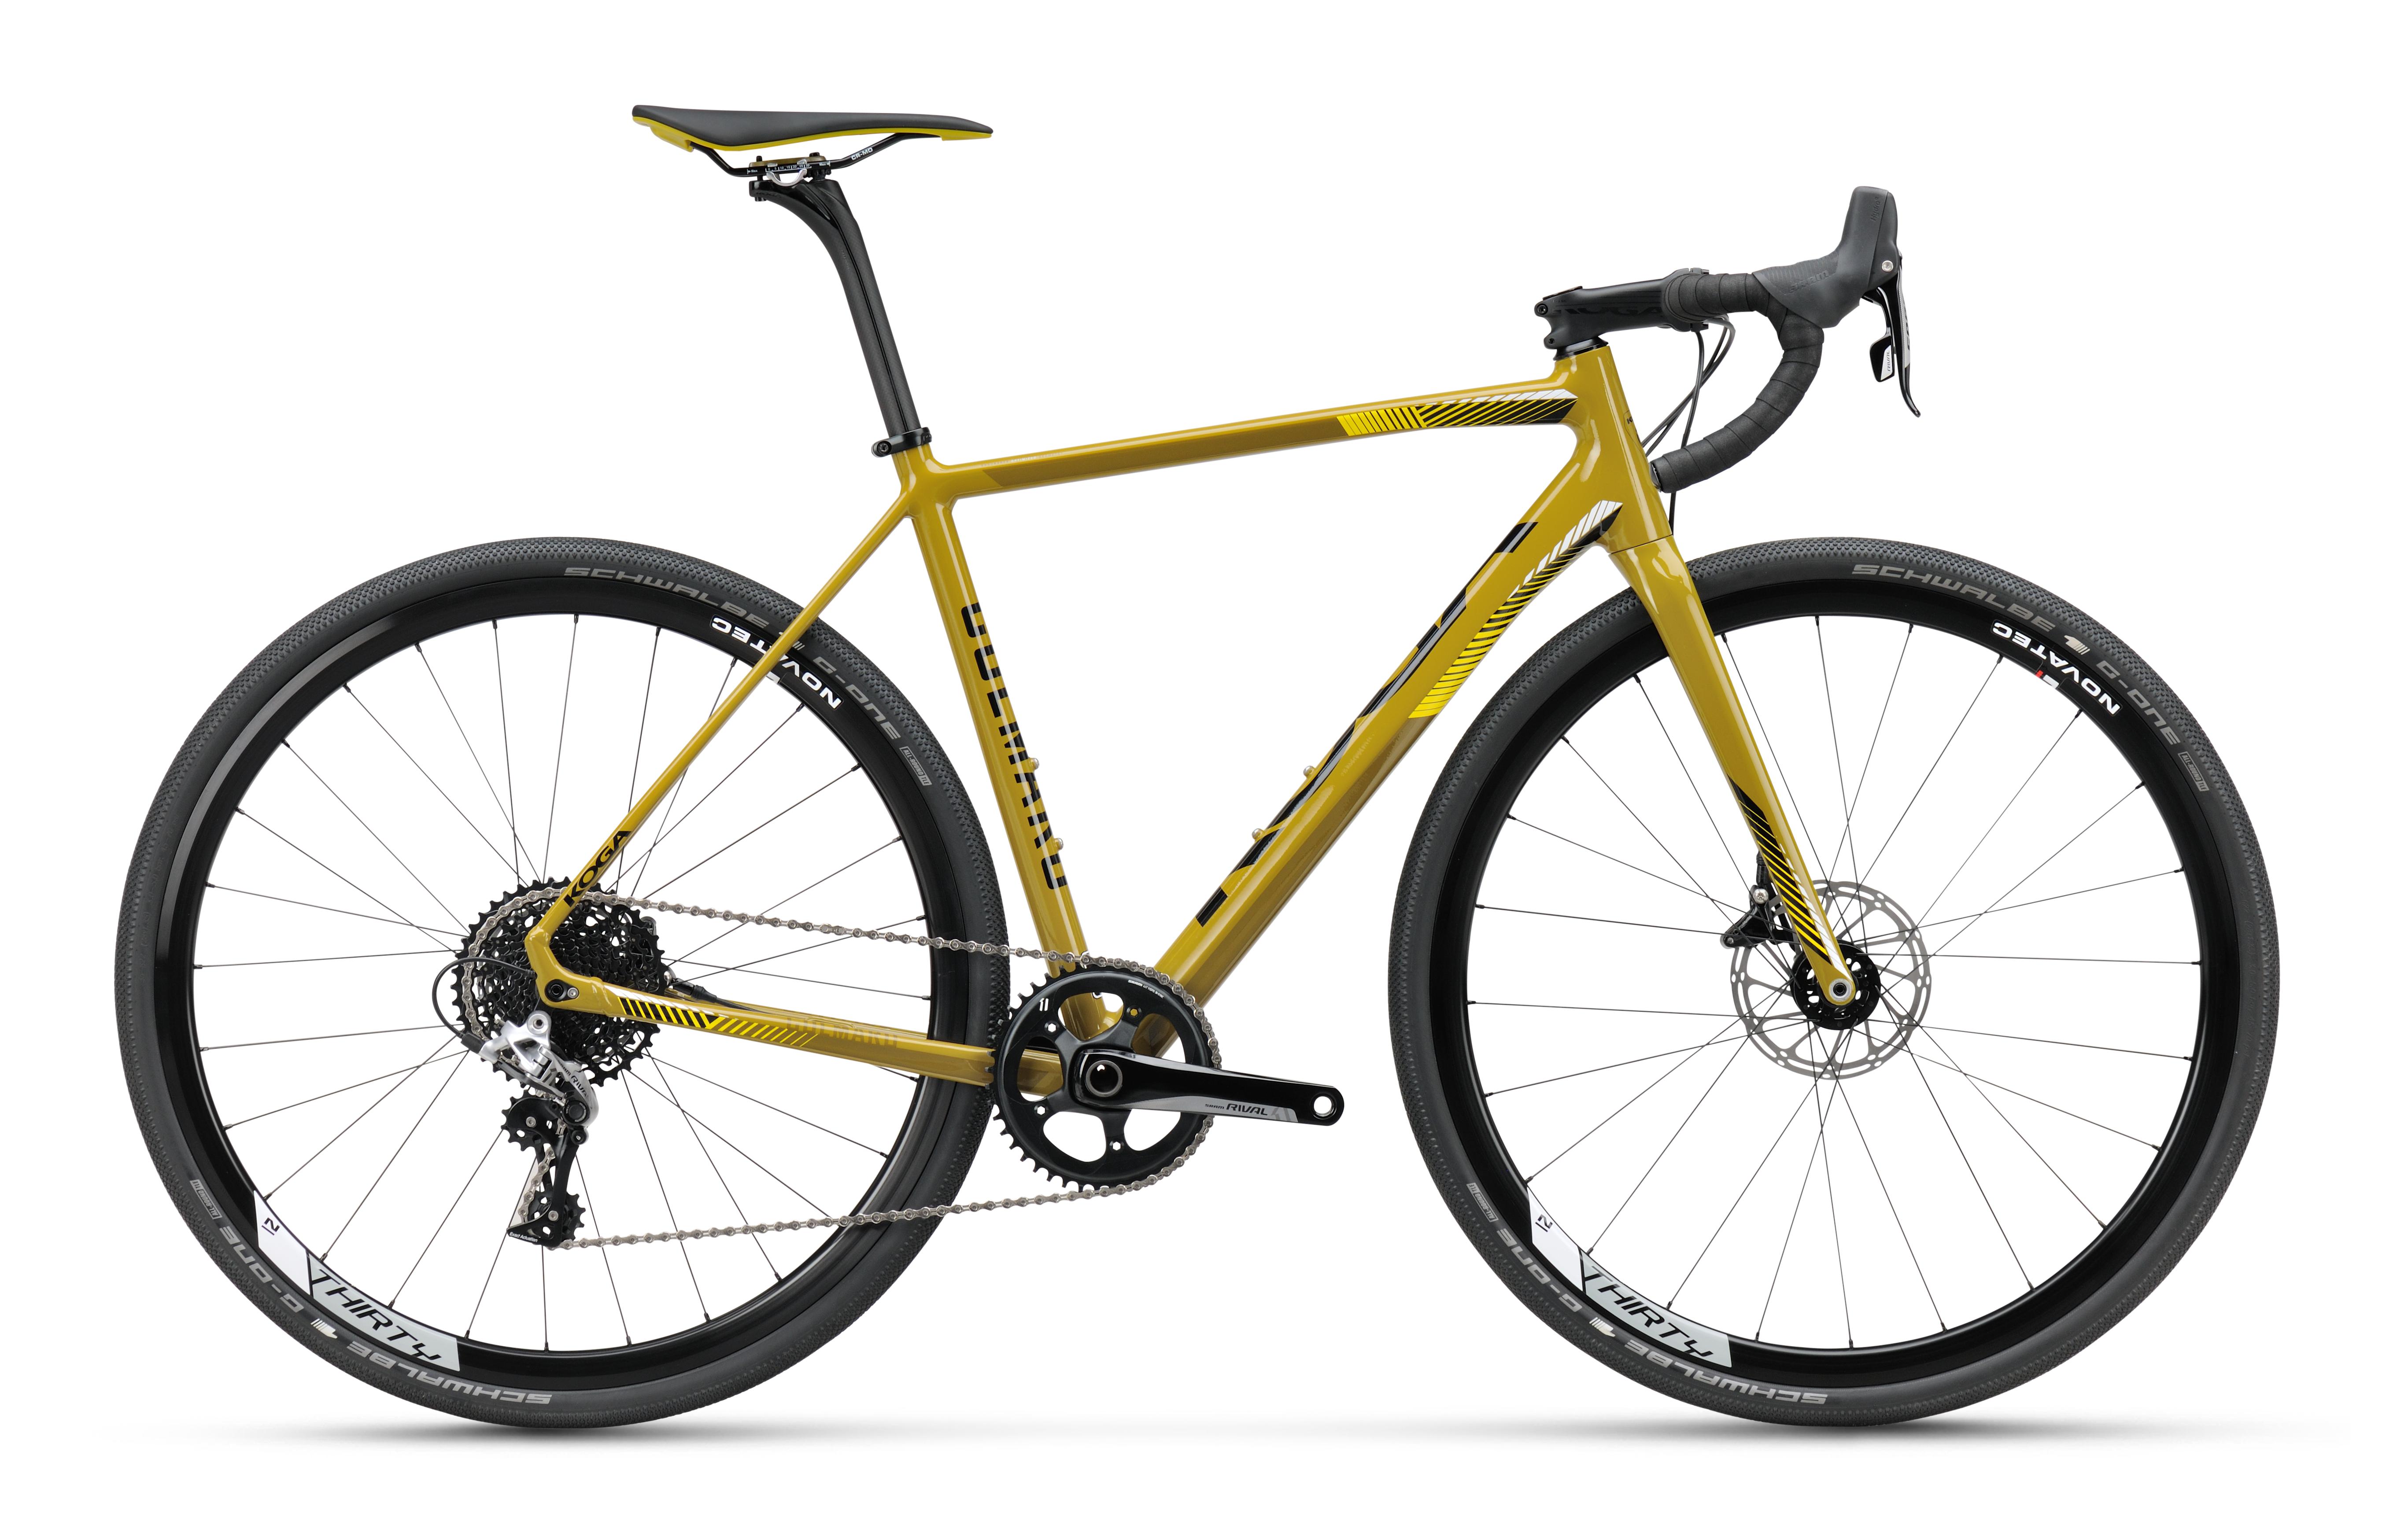 Koga Racefietsen Collectie Bicycle Bicycle Design Bike